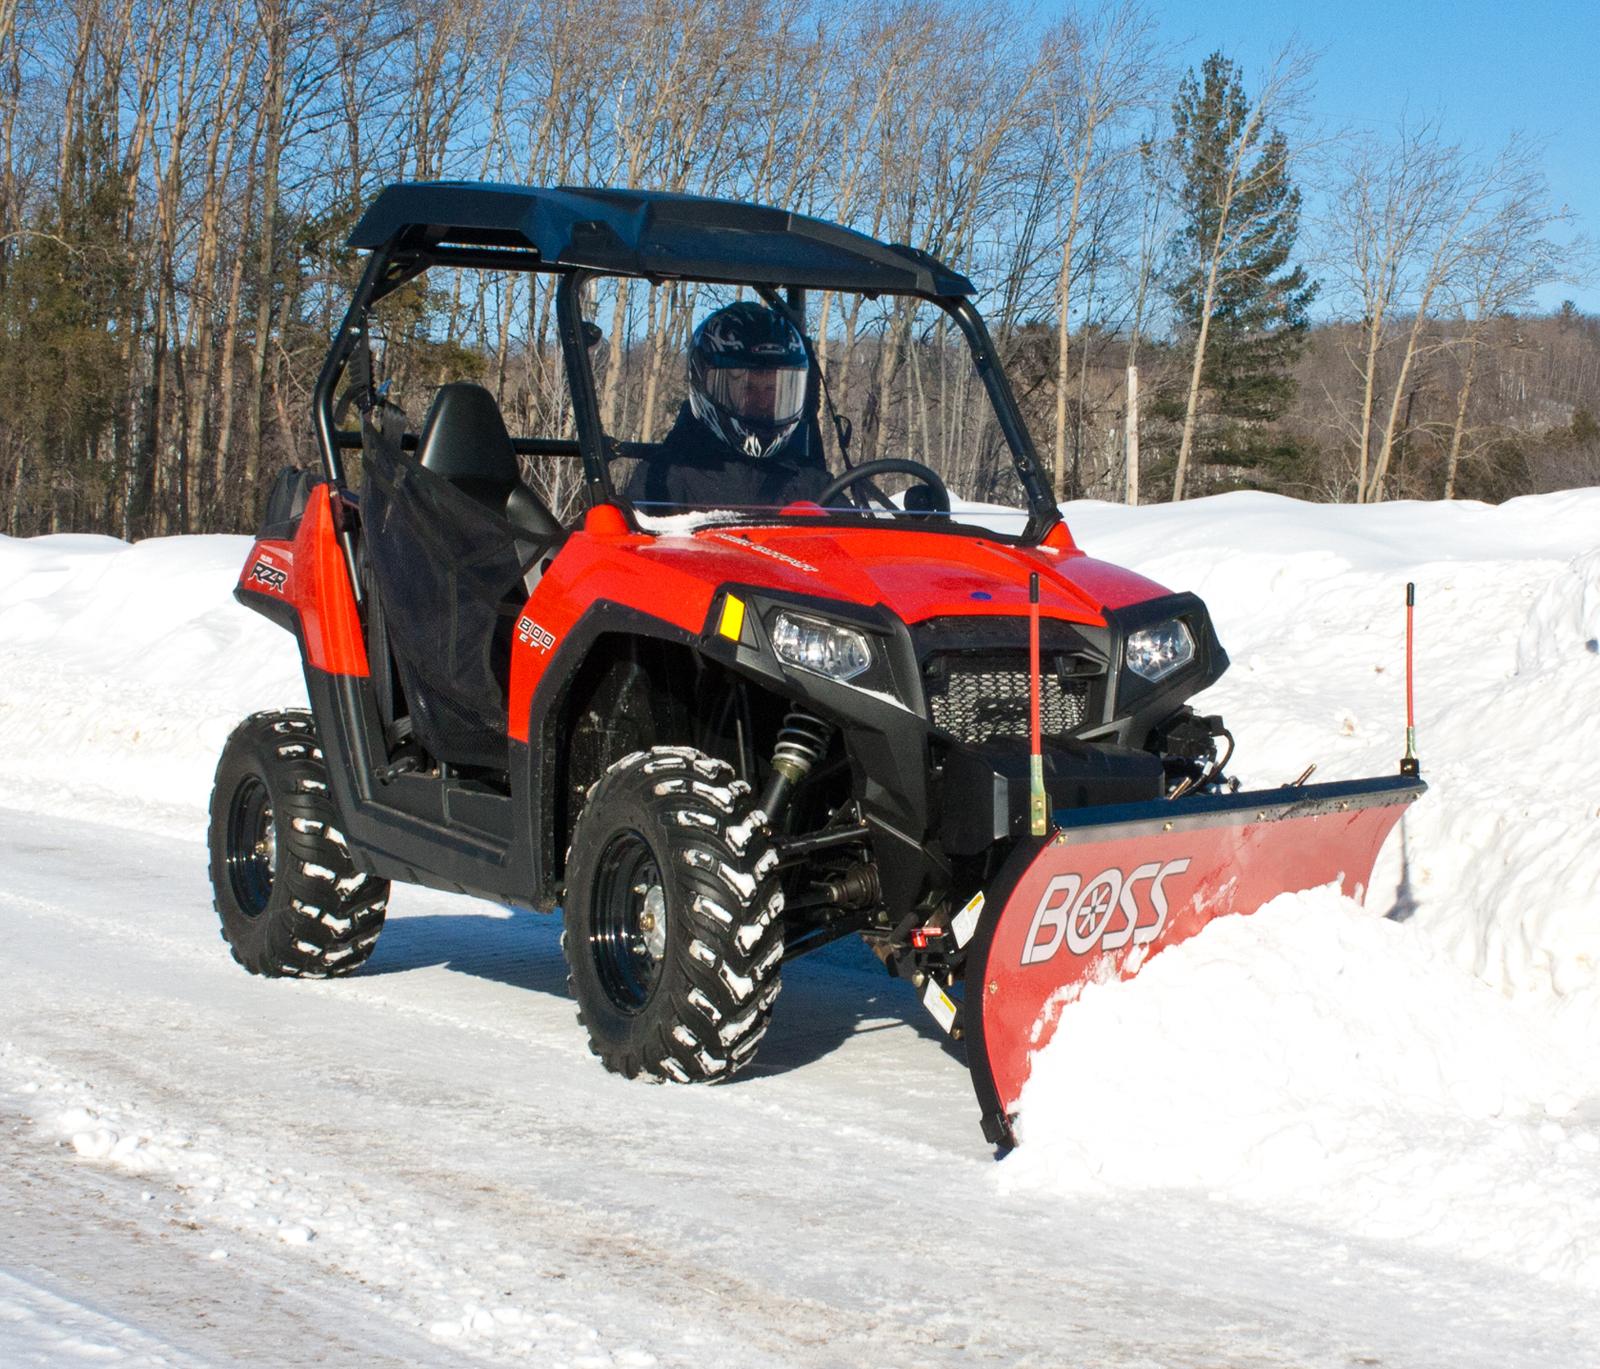 boss snow plows vw alternator conversion wiring diagram snowplow utv atv equipment